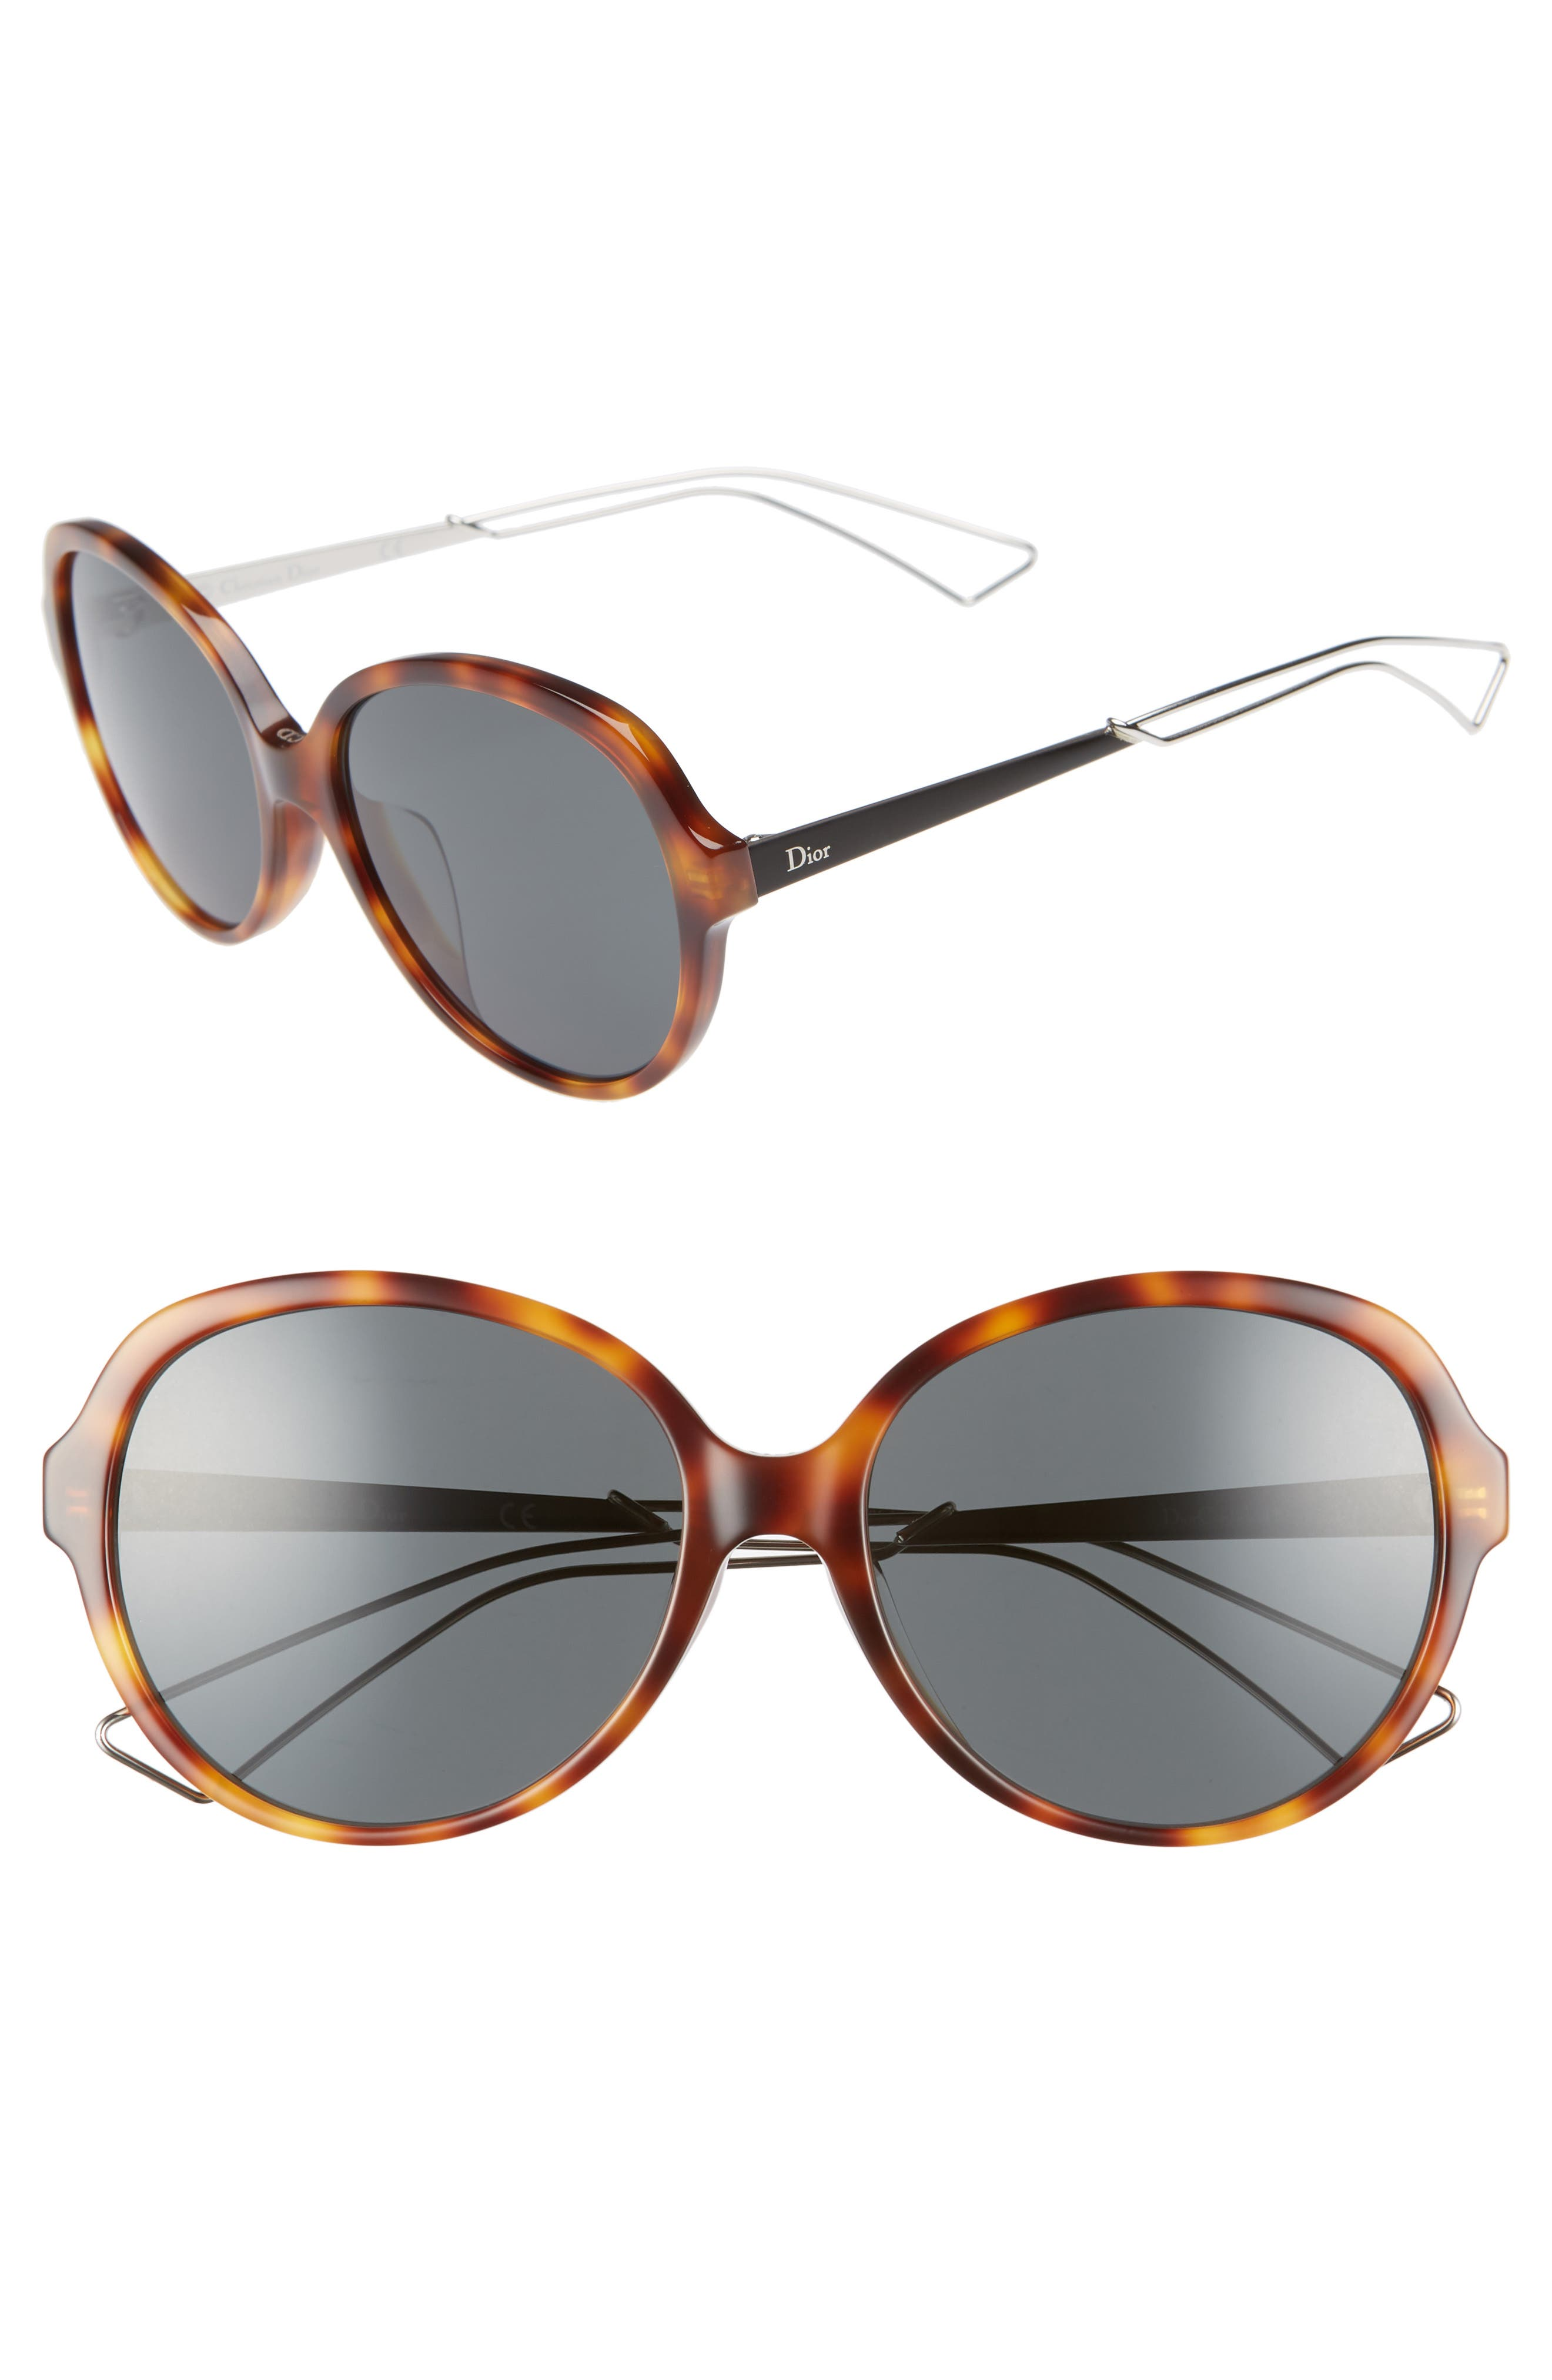 Confident 58mm Round Sunglasses,                             Main thumbnail 1, color,                             HAVANA/ PALLADIUM